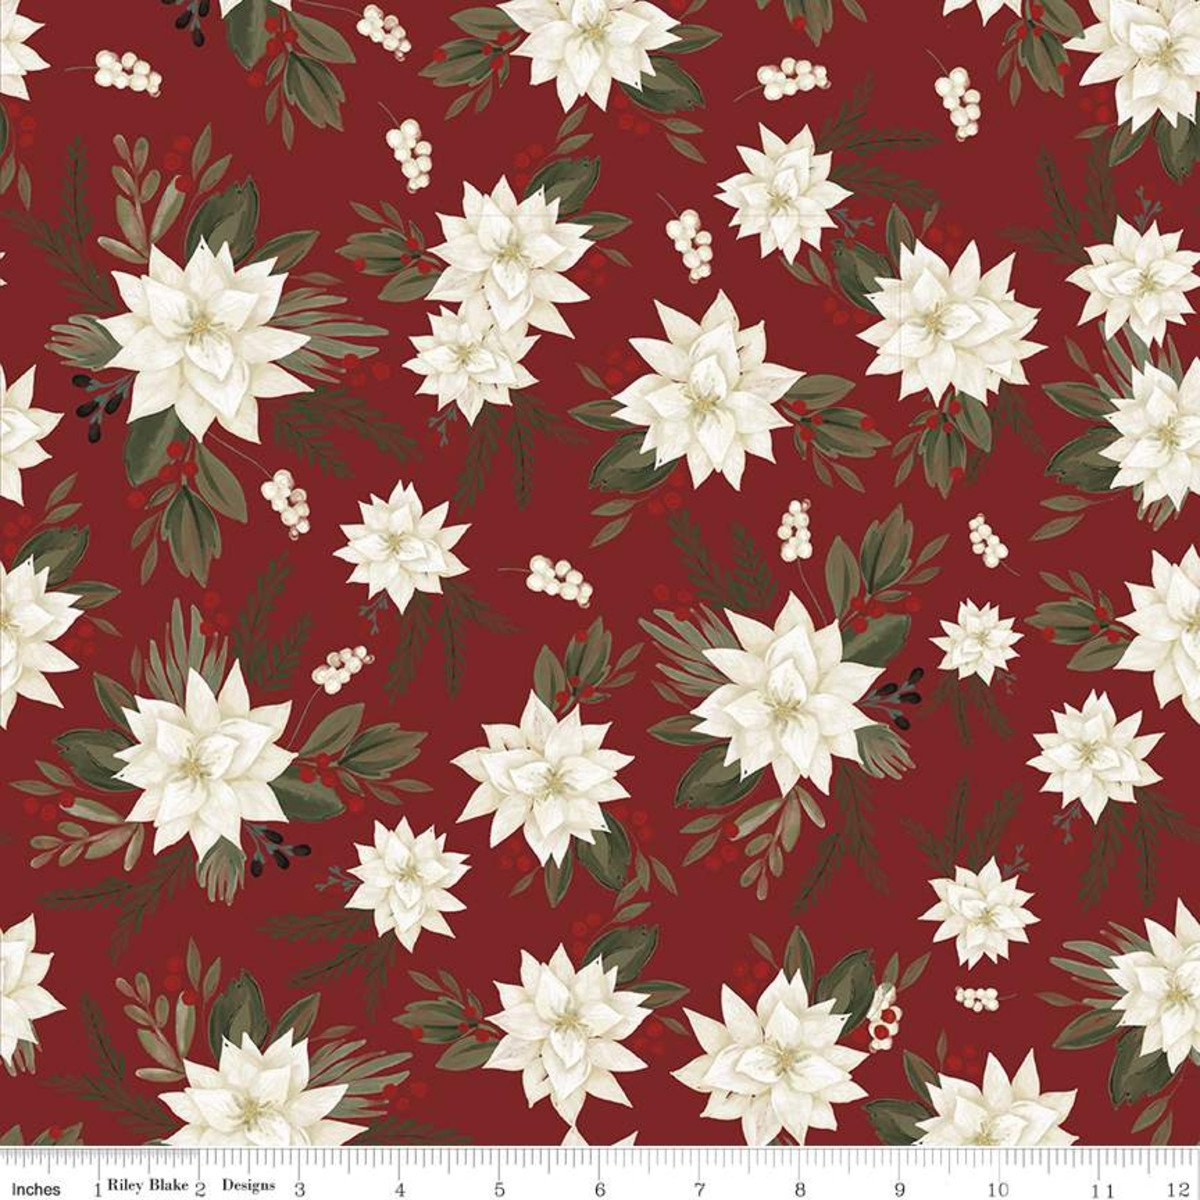 Farmhouse Christmas C10950 Poinsettias Red